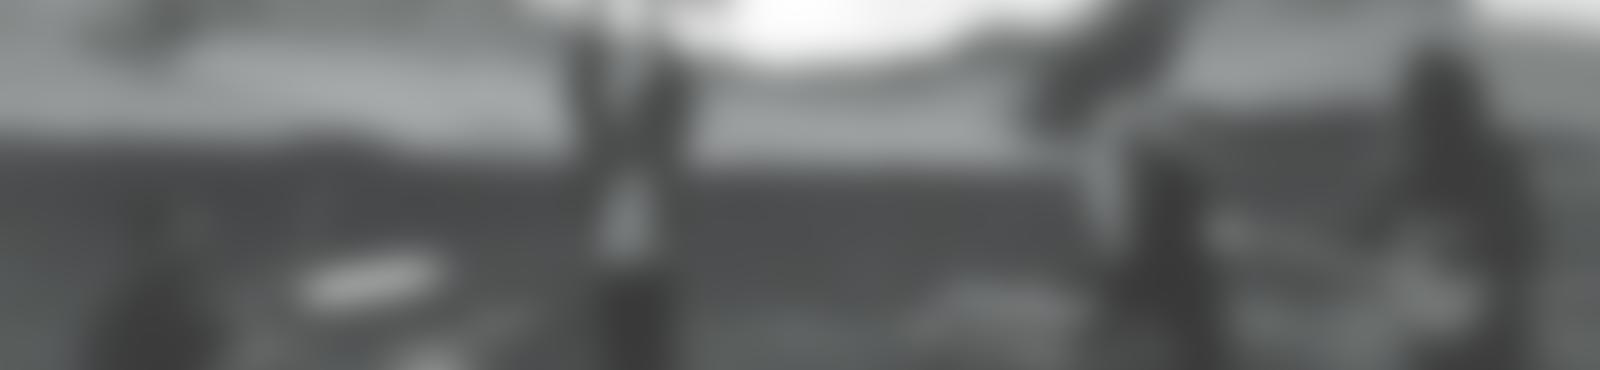 Blurred a6a20fbc 4e5b 4234 9947 843b11a9318c